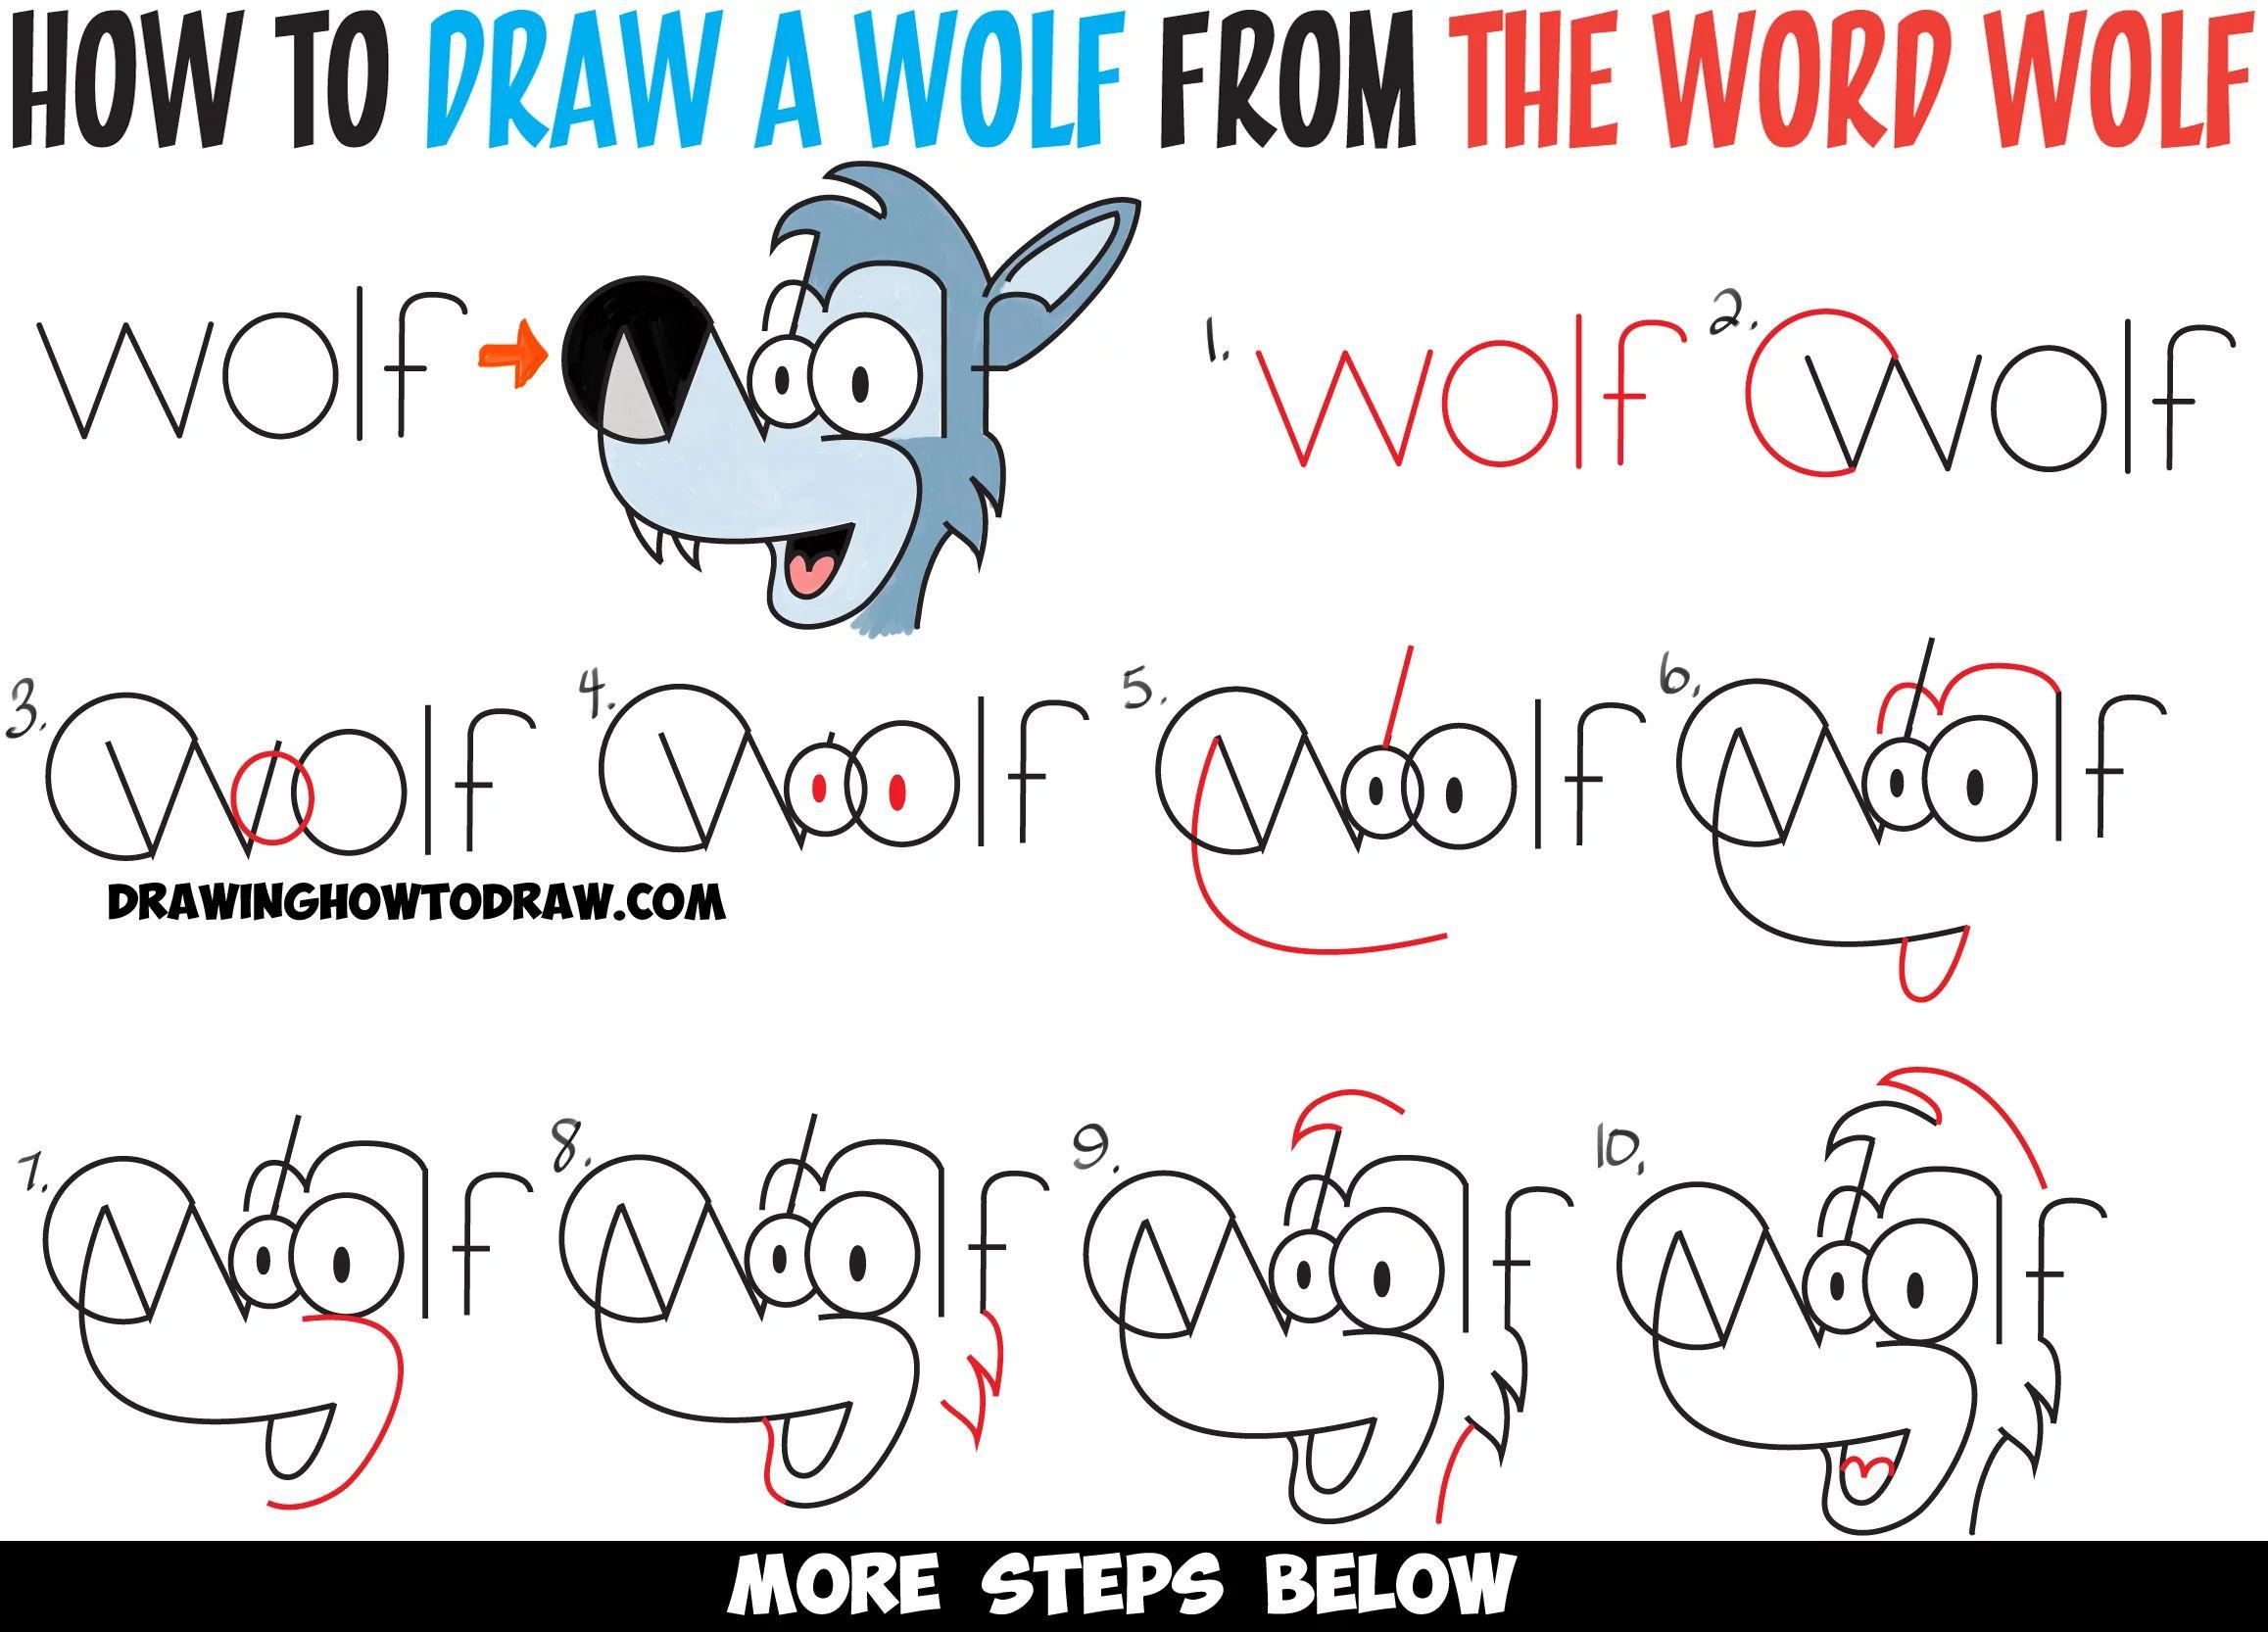 How To Make A Cartoon Story On Word